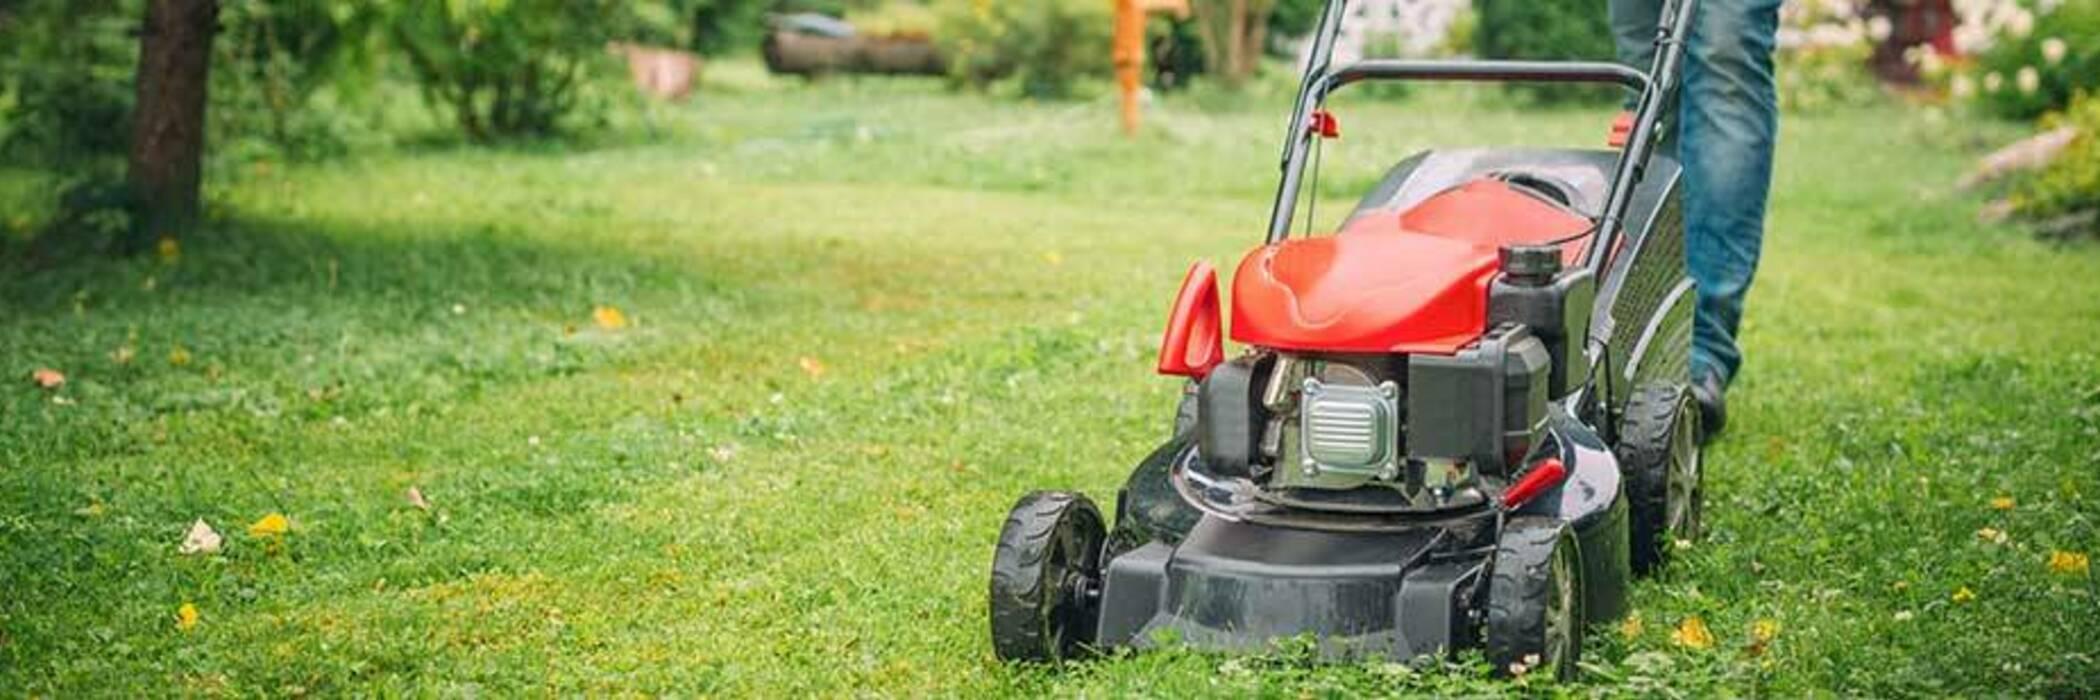 Man using a lawnmower in backyard.